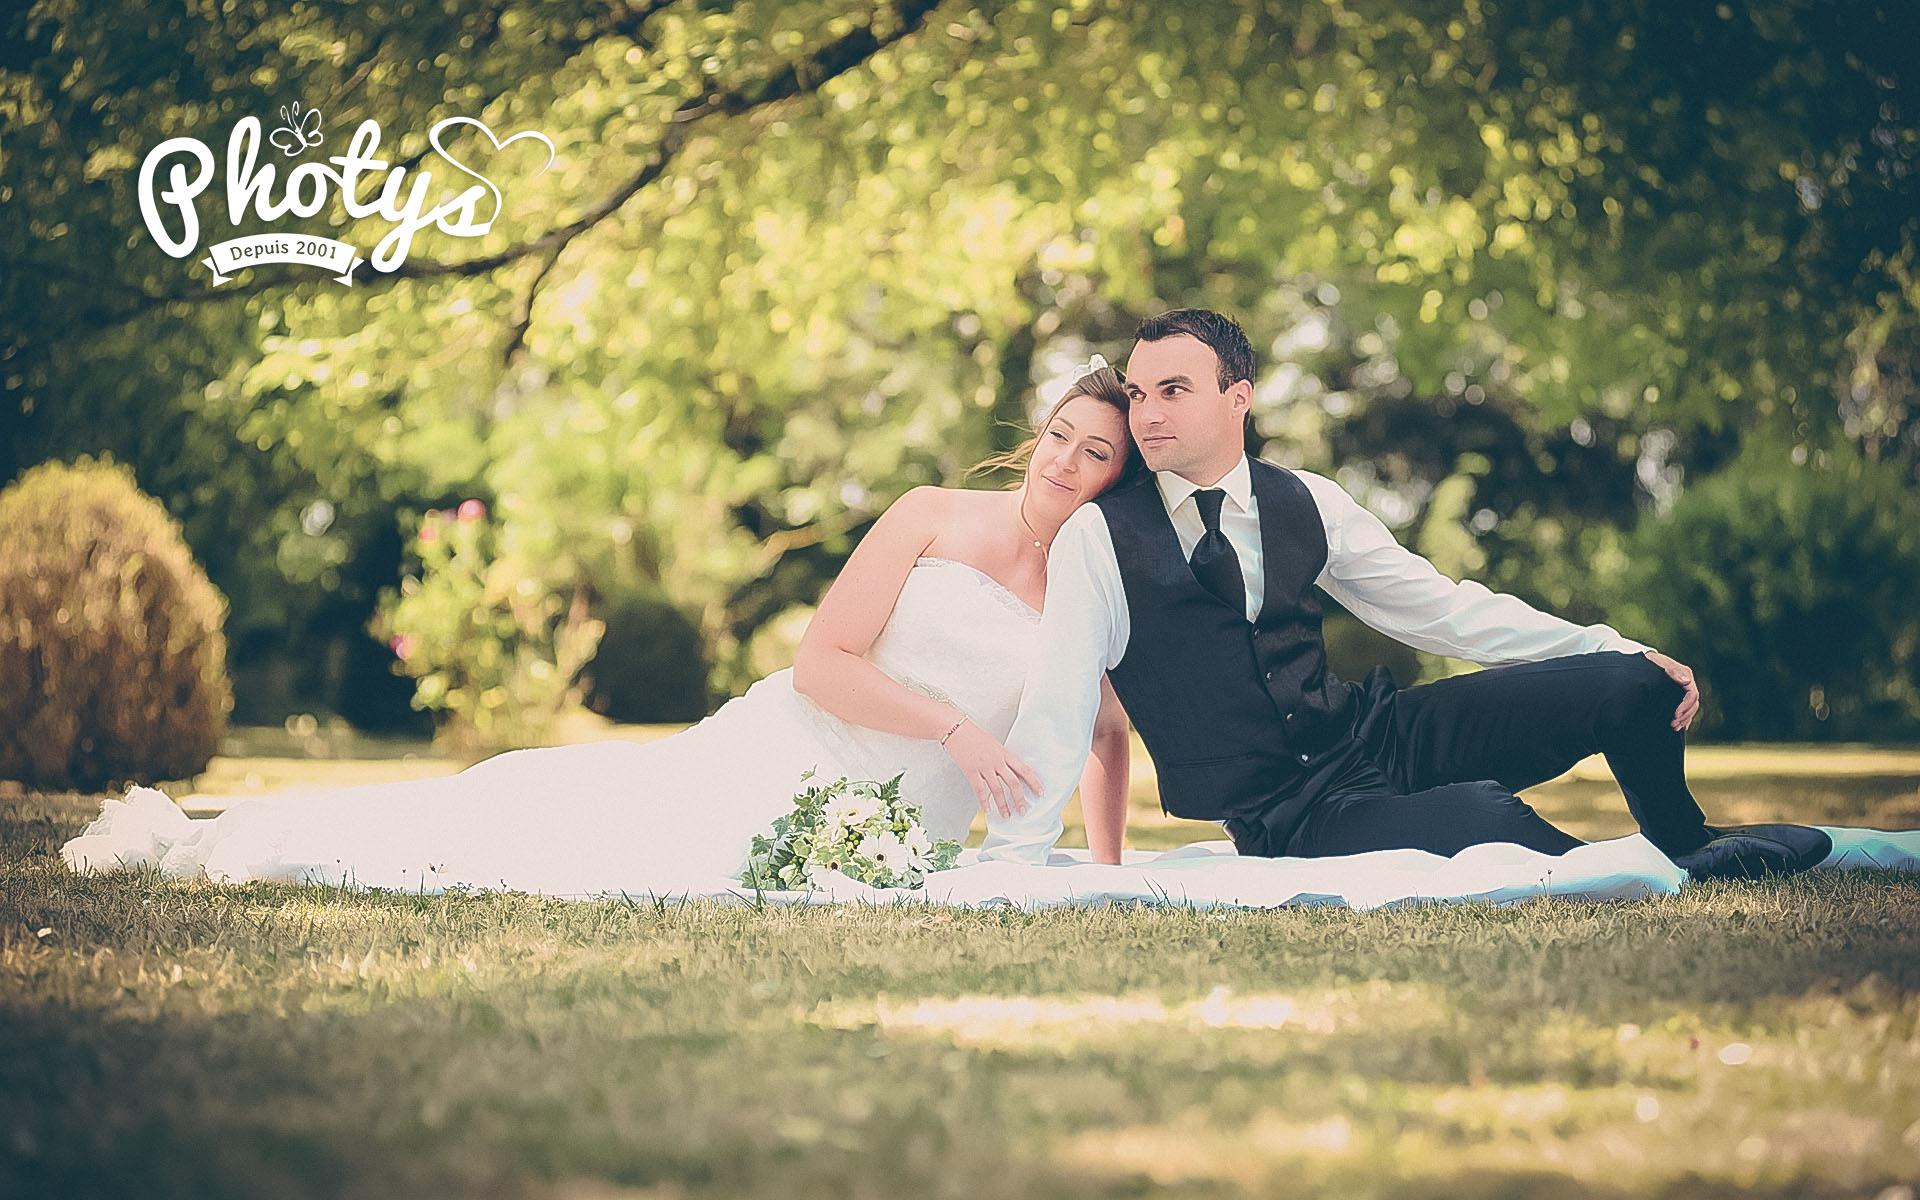 Photographe de mariage Polliat 01